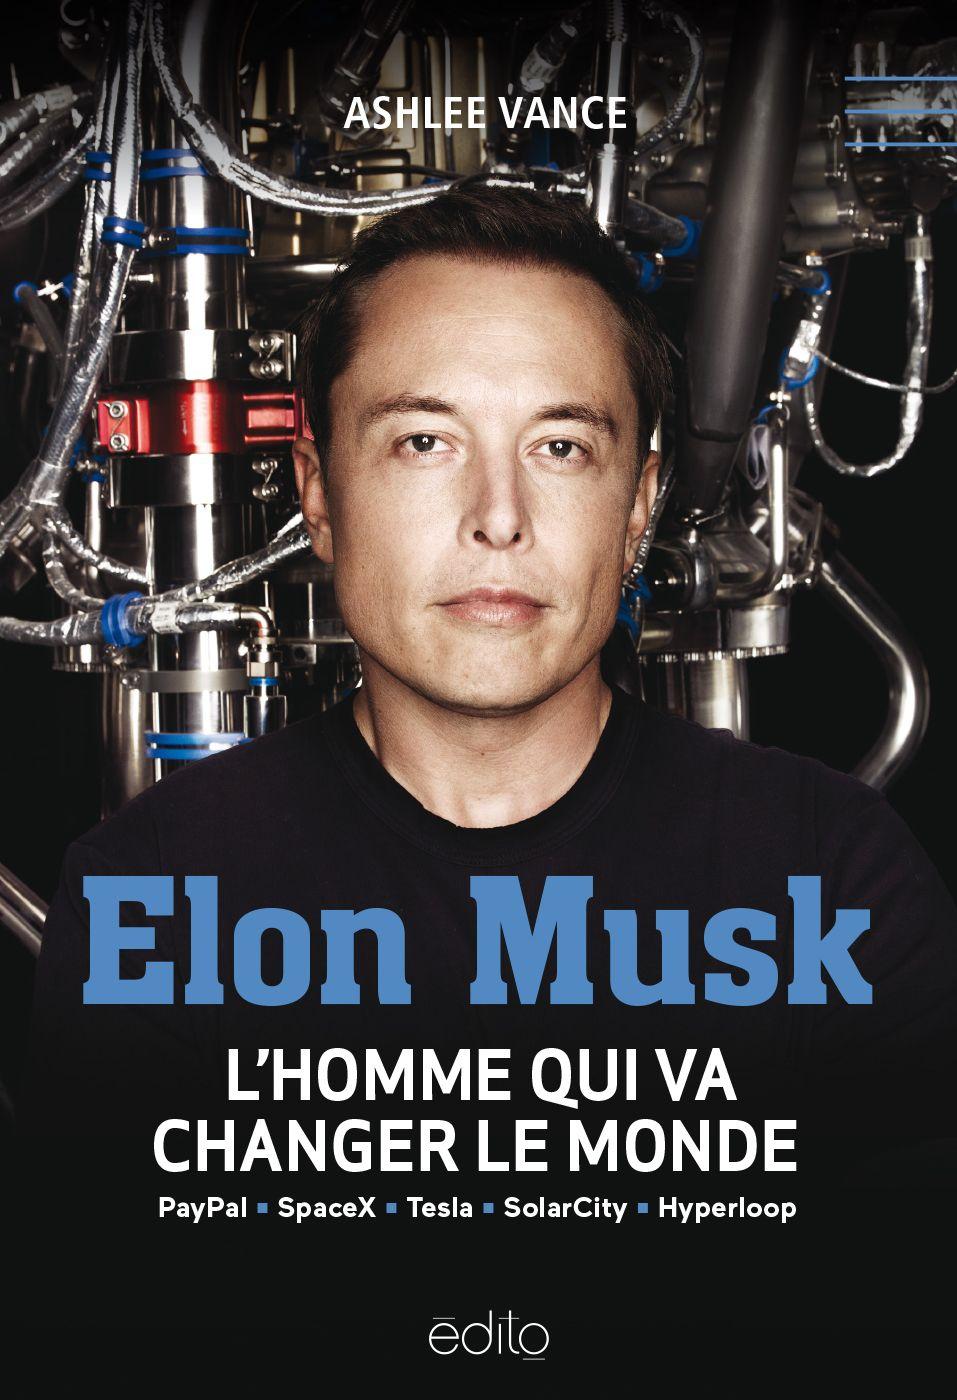 ebook elon musk l 39 homme qui va changer le monde par ashlee vance 7switch. Black Bedroom Furniture Sets. Home Design Ideas